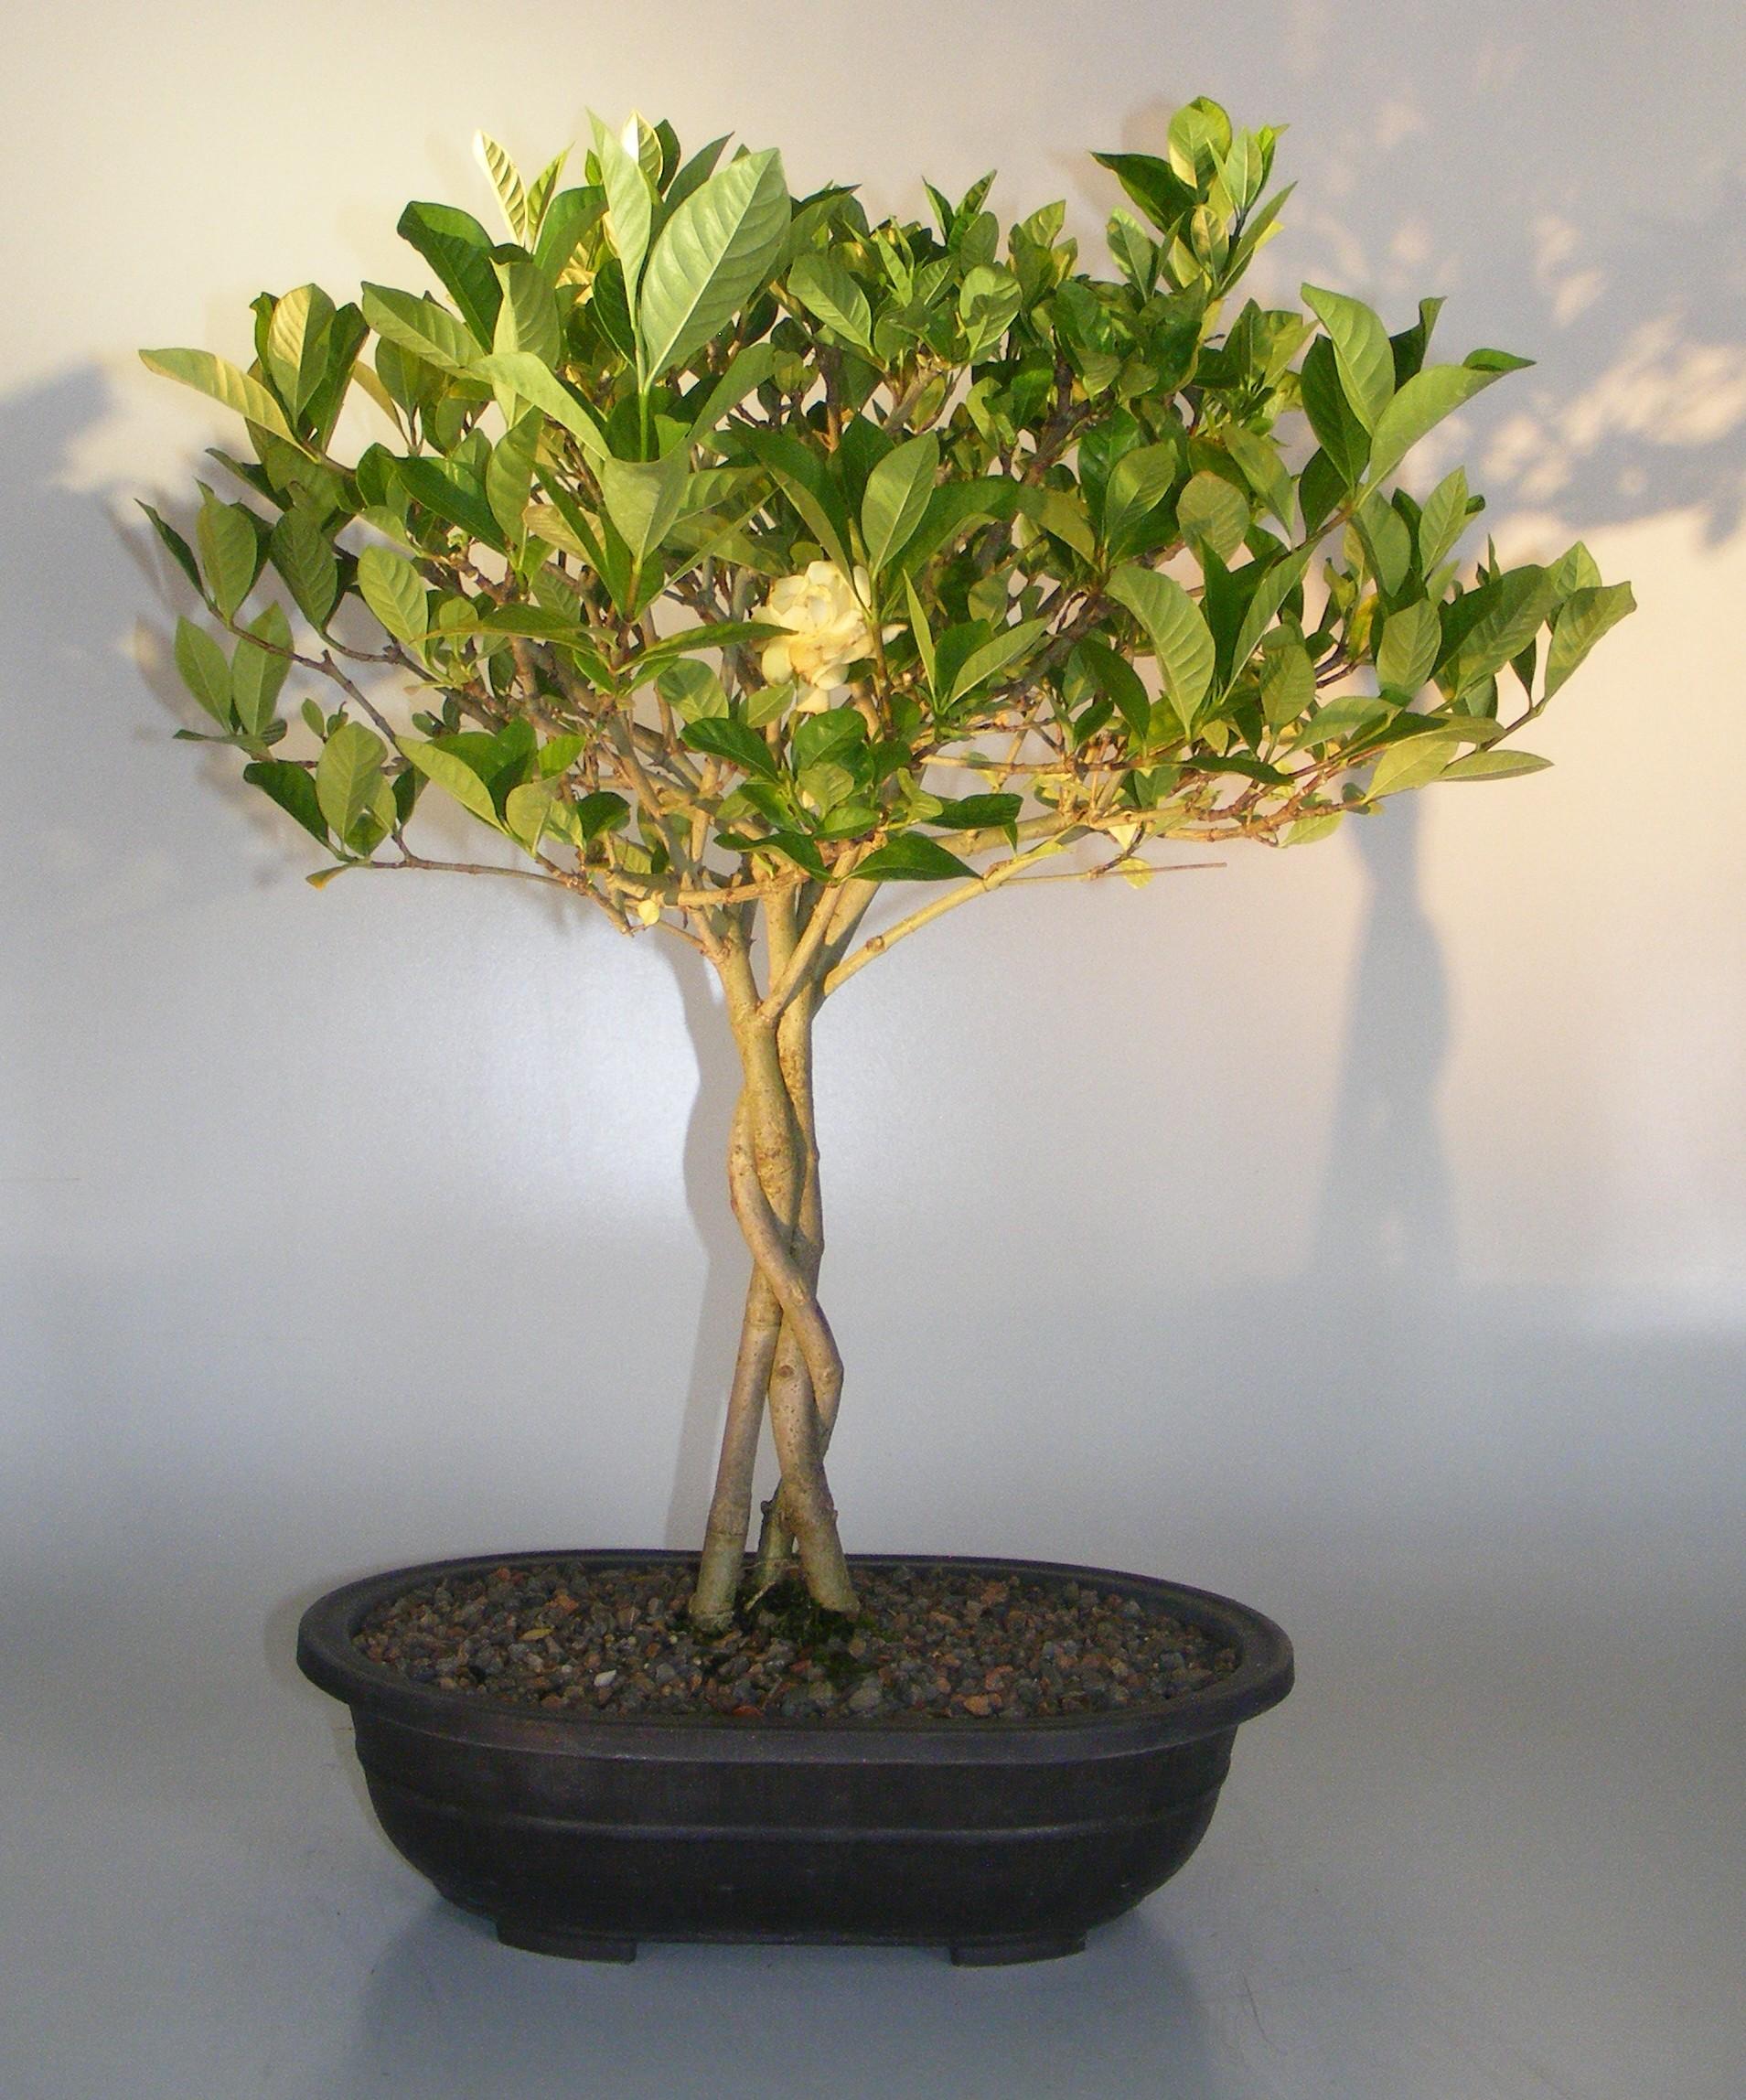 Flowering Gardenia Bonsai Tree Braided Trunk Jasminoides Miami Supreme